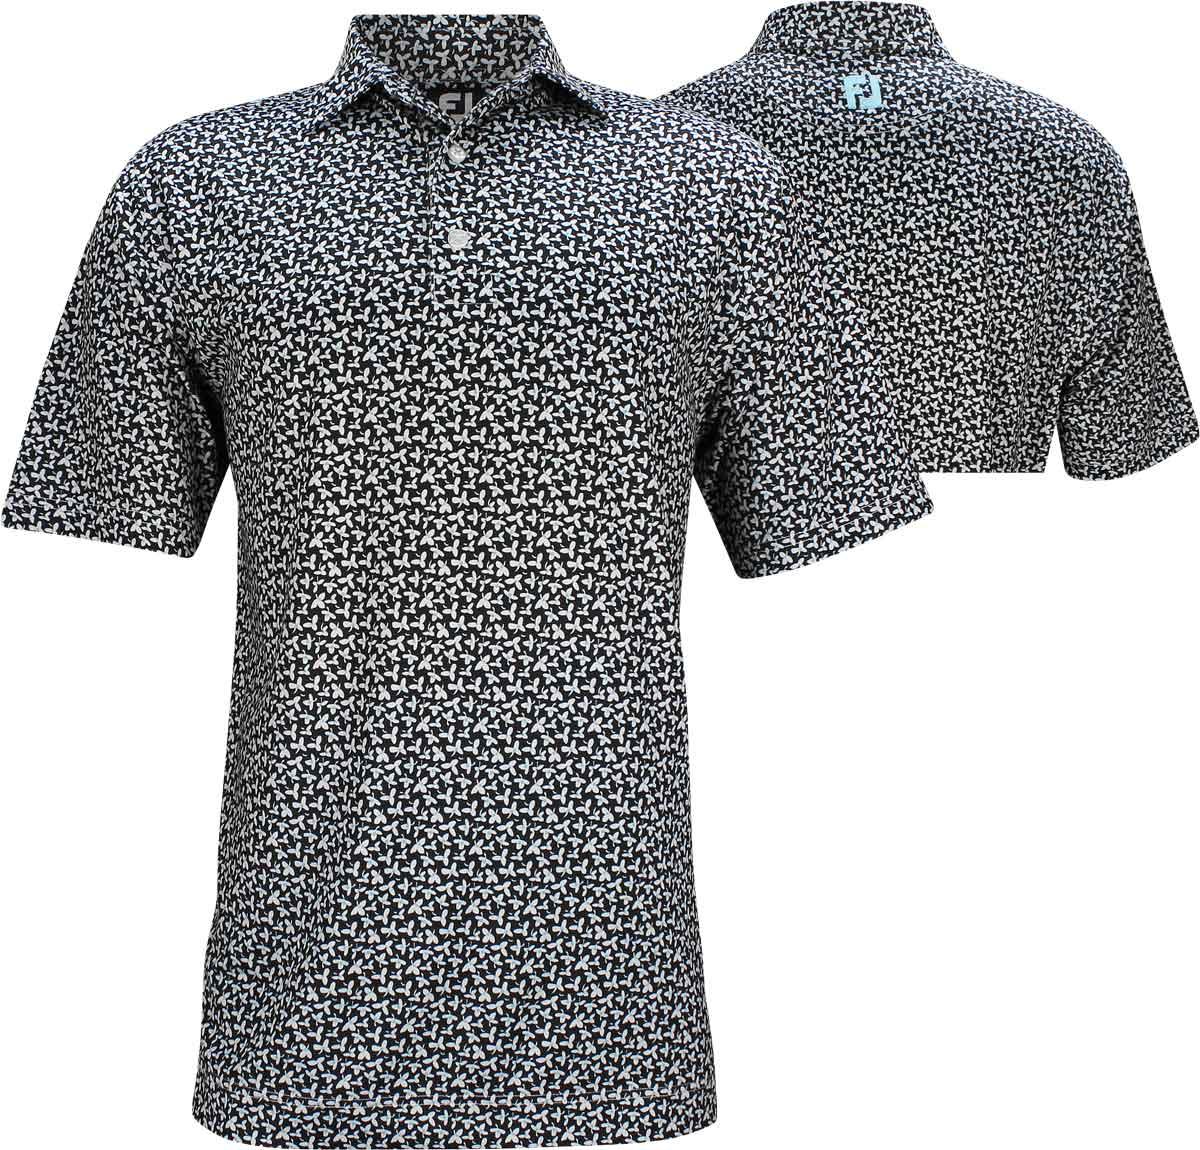 Footjoy Lisle Floral Print Golf Shirts